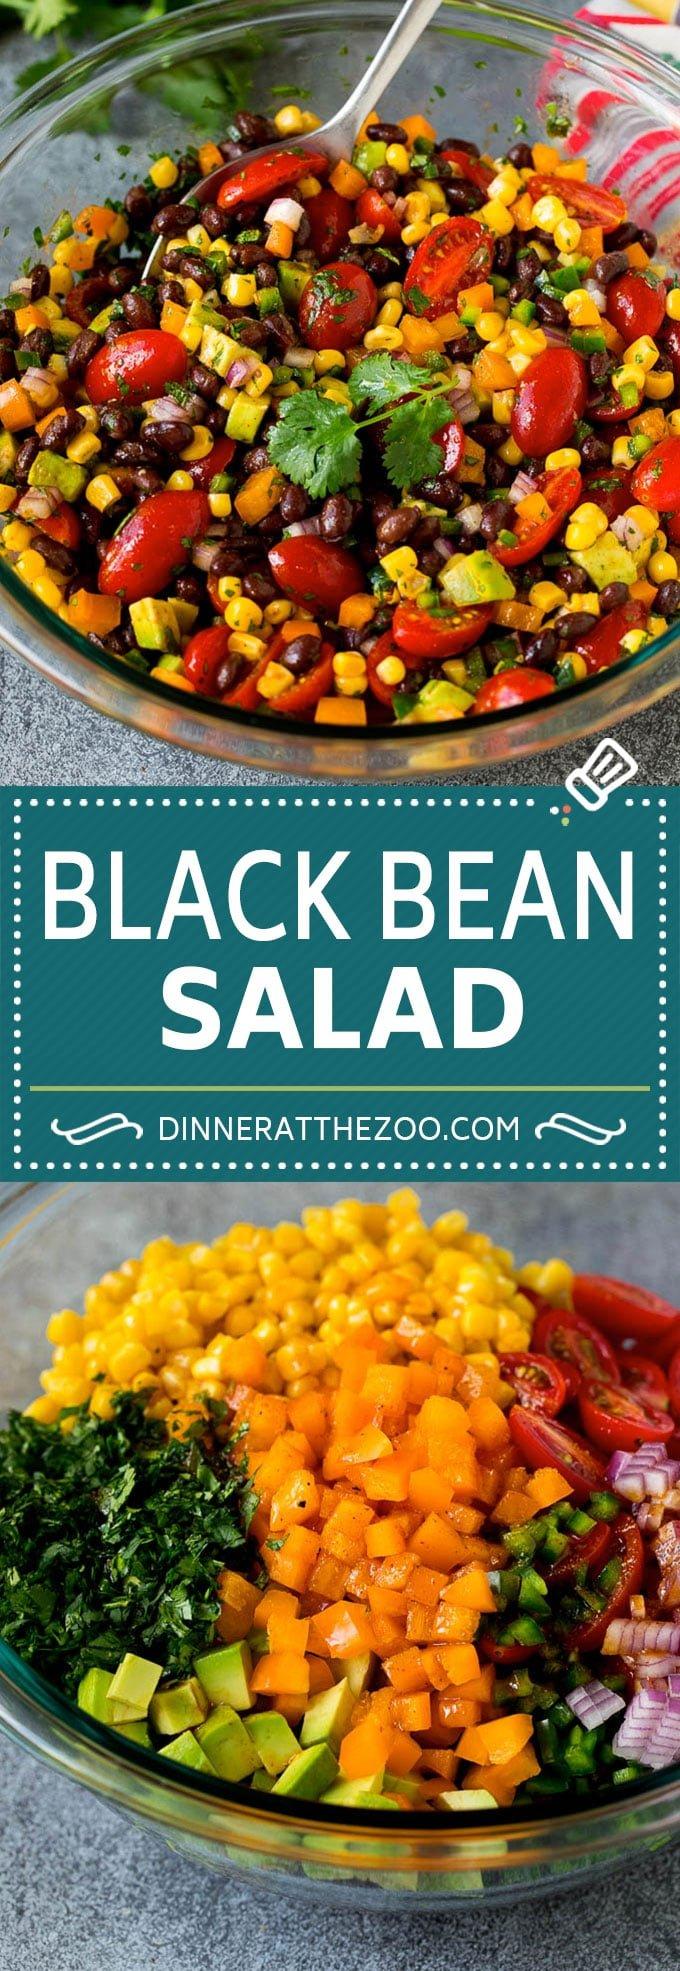 Black Bean Salad Recipe #beans #blackbeans #salad #healthy #dinneratthezoo #avocado